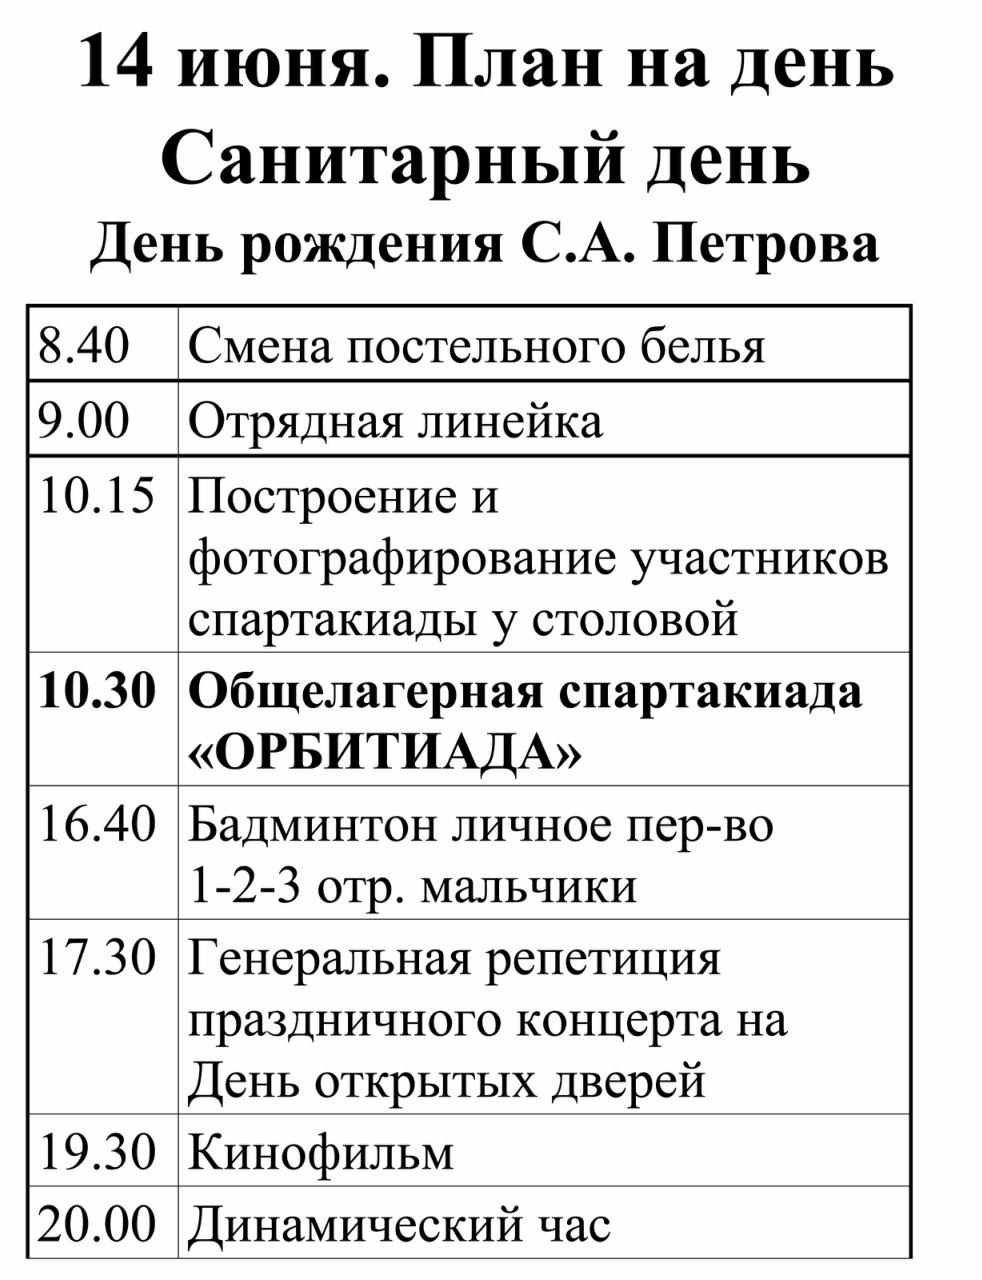 14 июня план на день.jpg